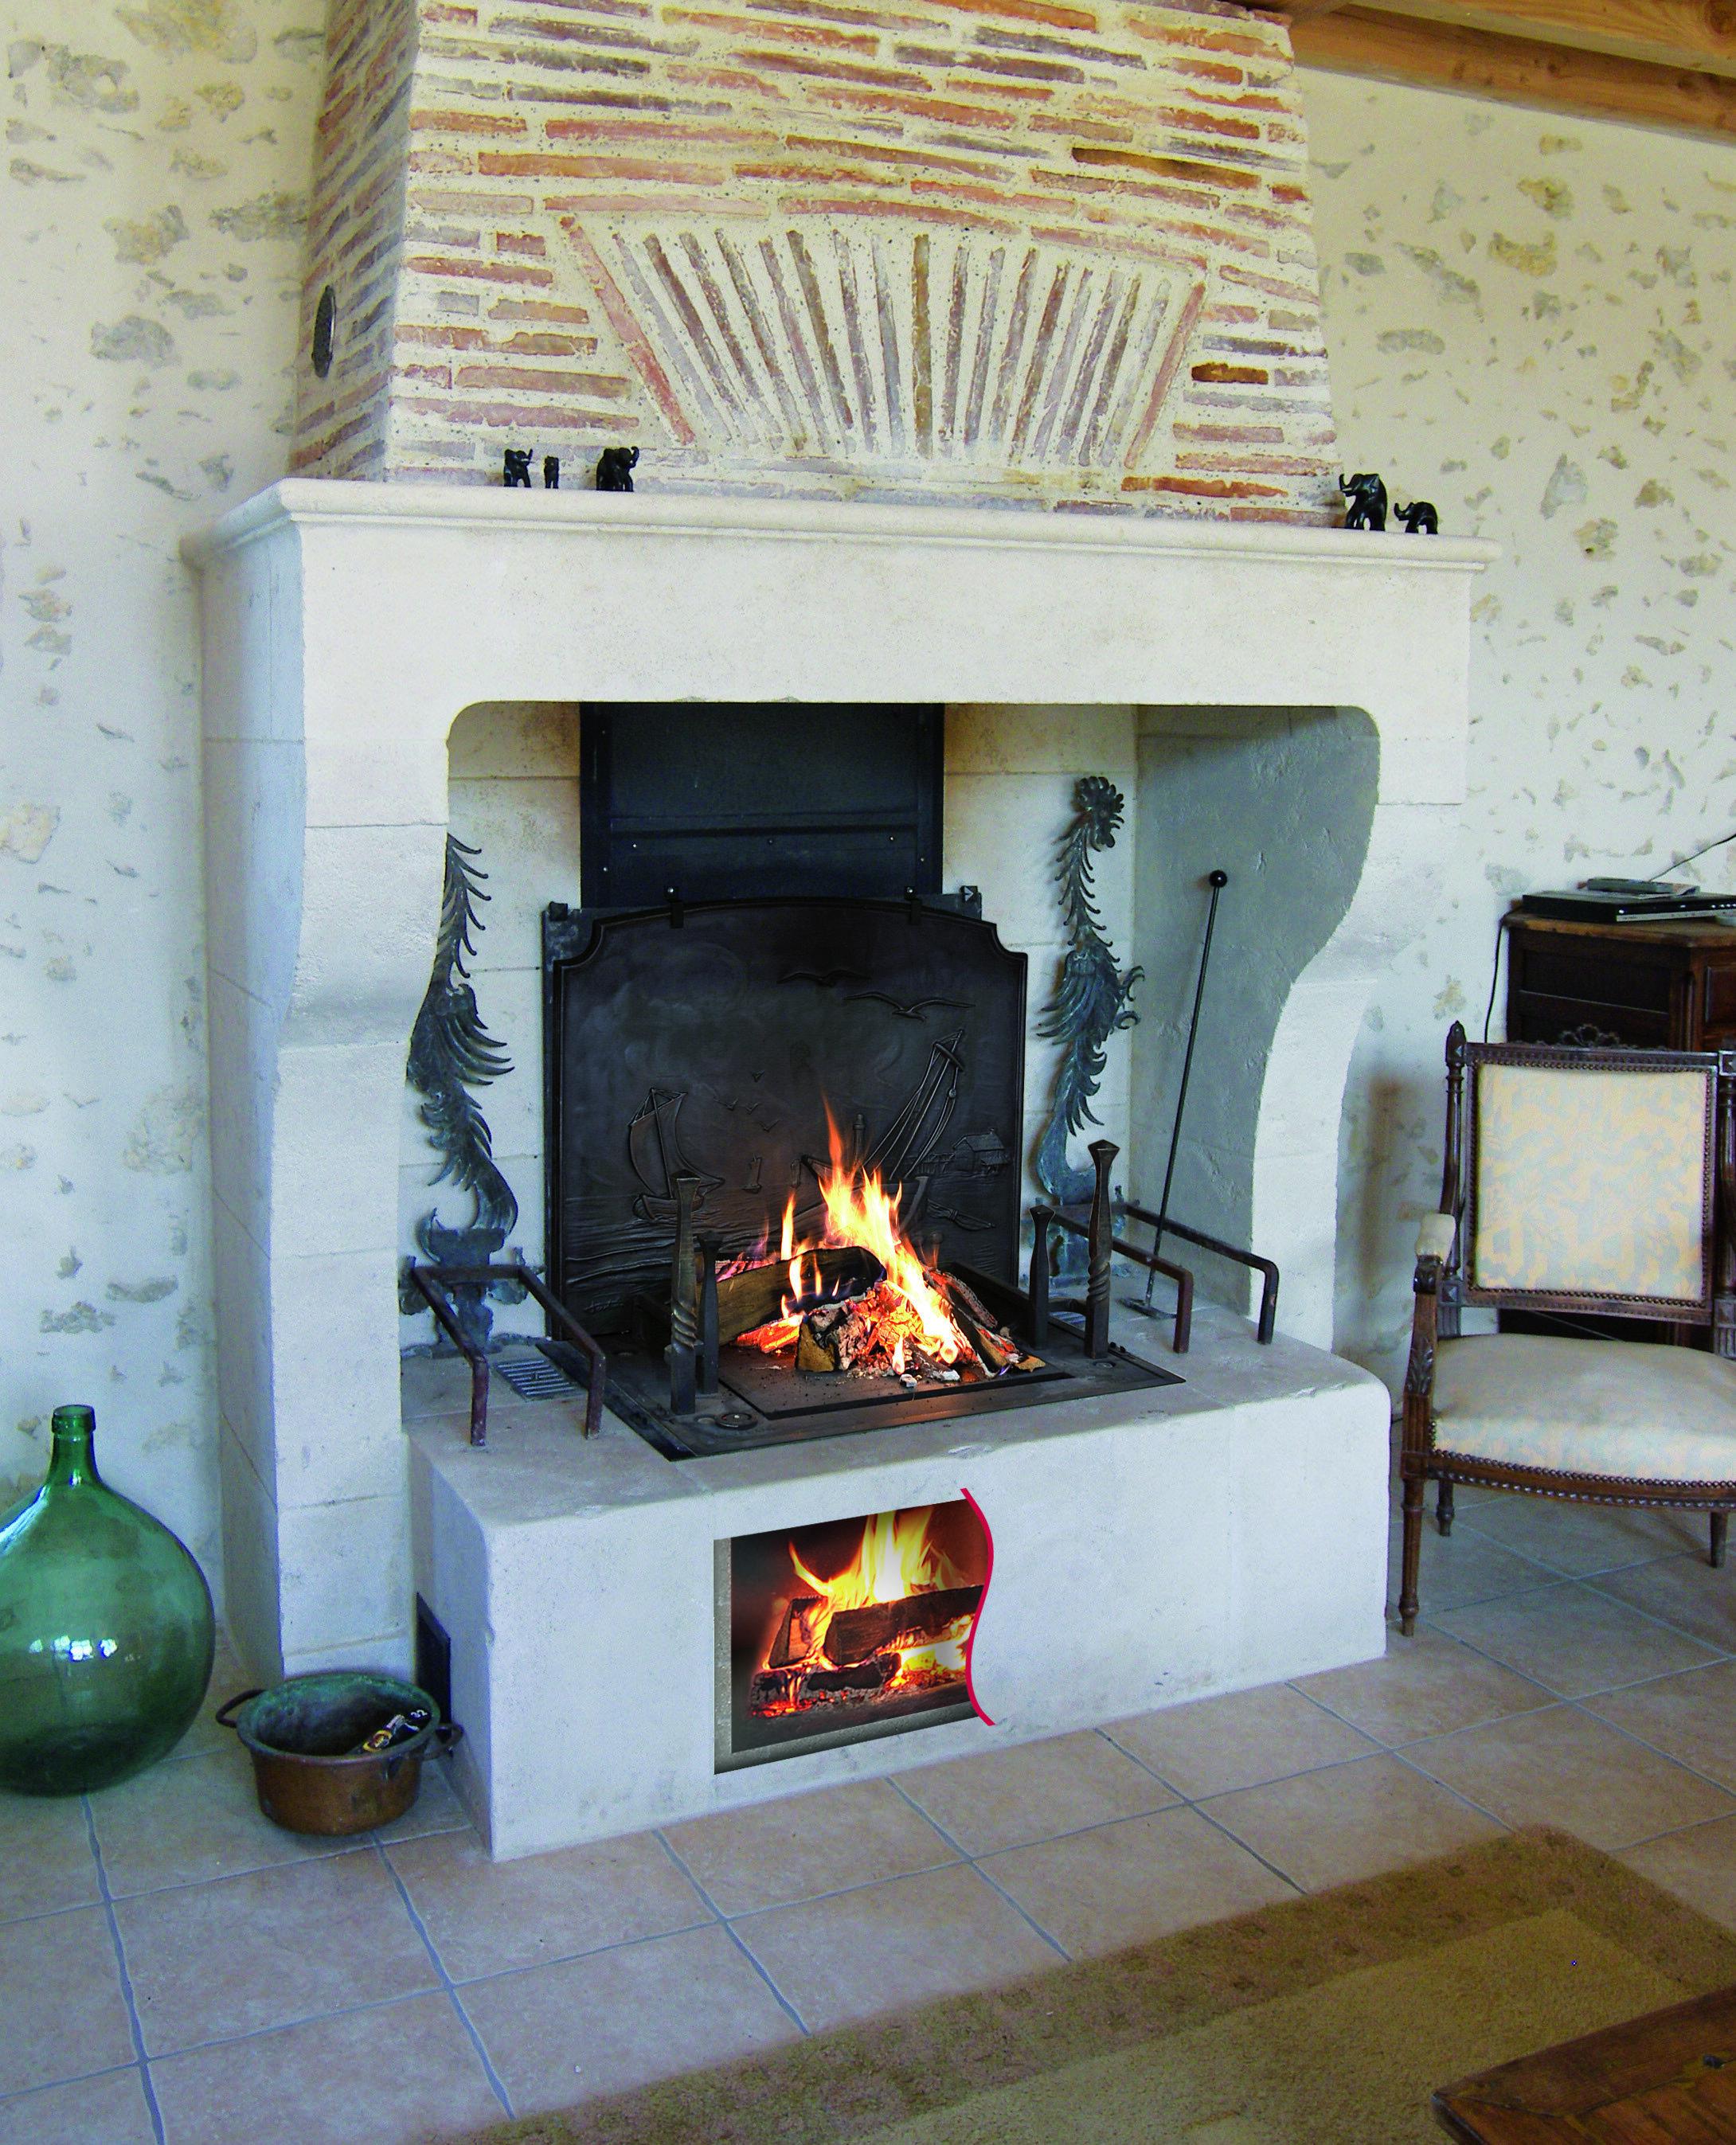 Renovation De Cheminee Ancienne cheminees de style — henri de almeida créations